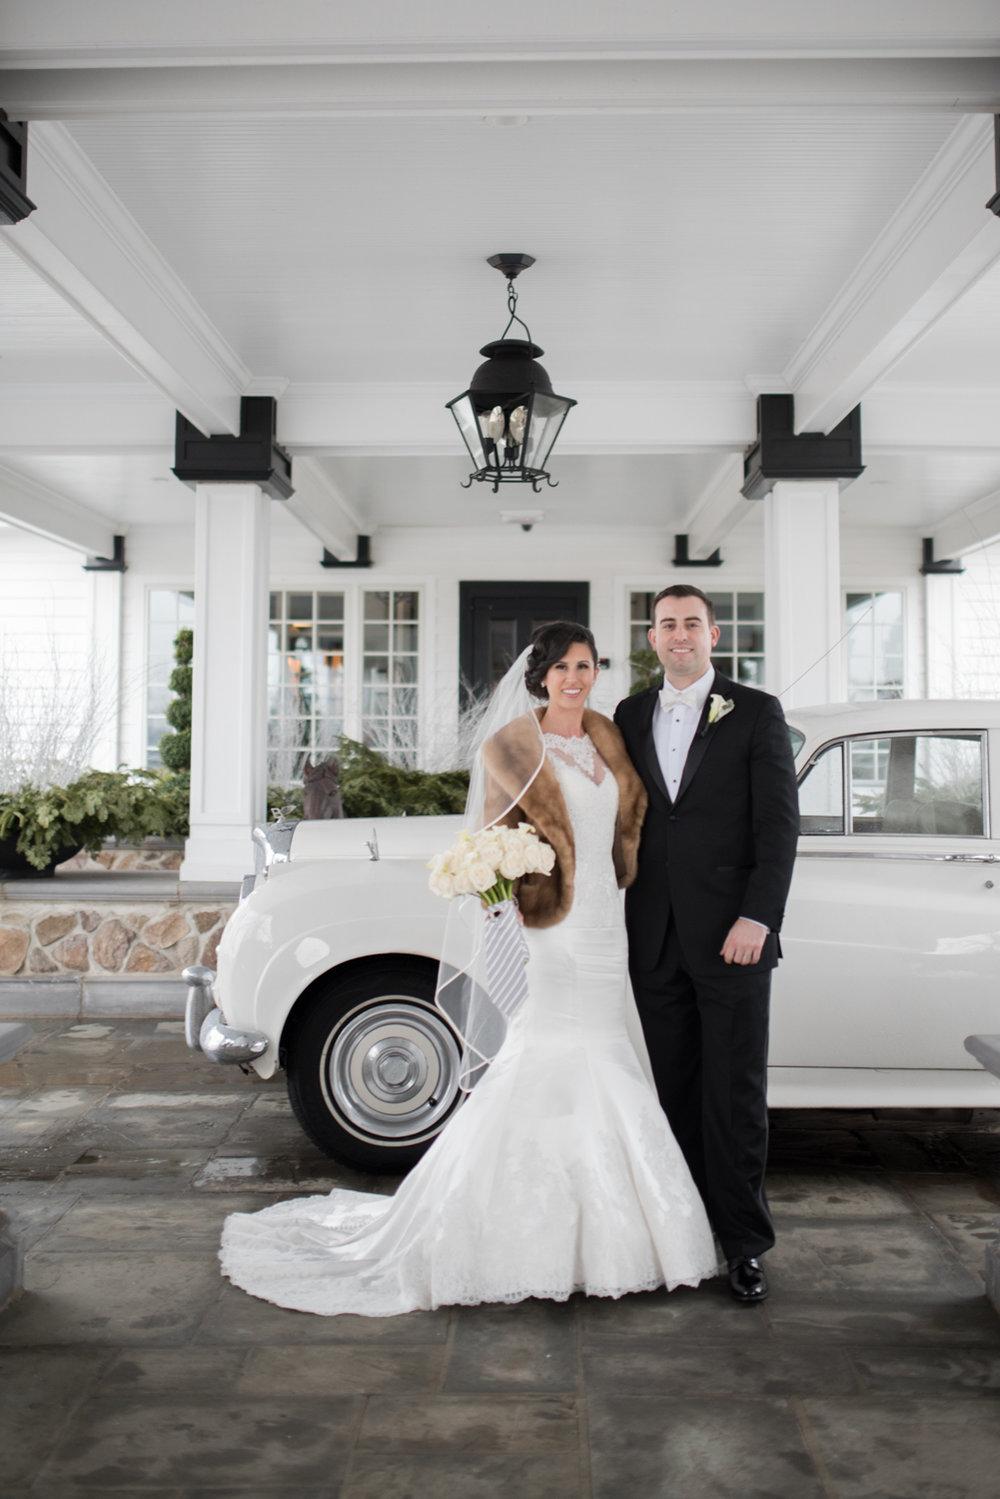 Michelle+Joe- Ryland Inn Wedding- New Jersey-Olivia Christina Photo - BLOG-216.JPG